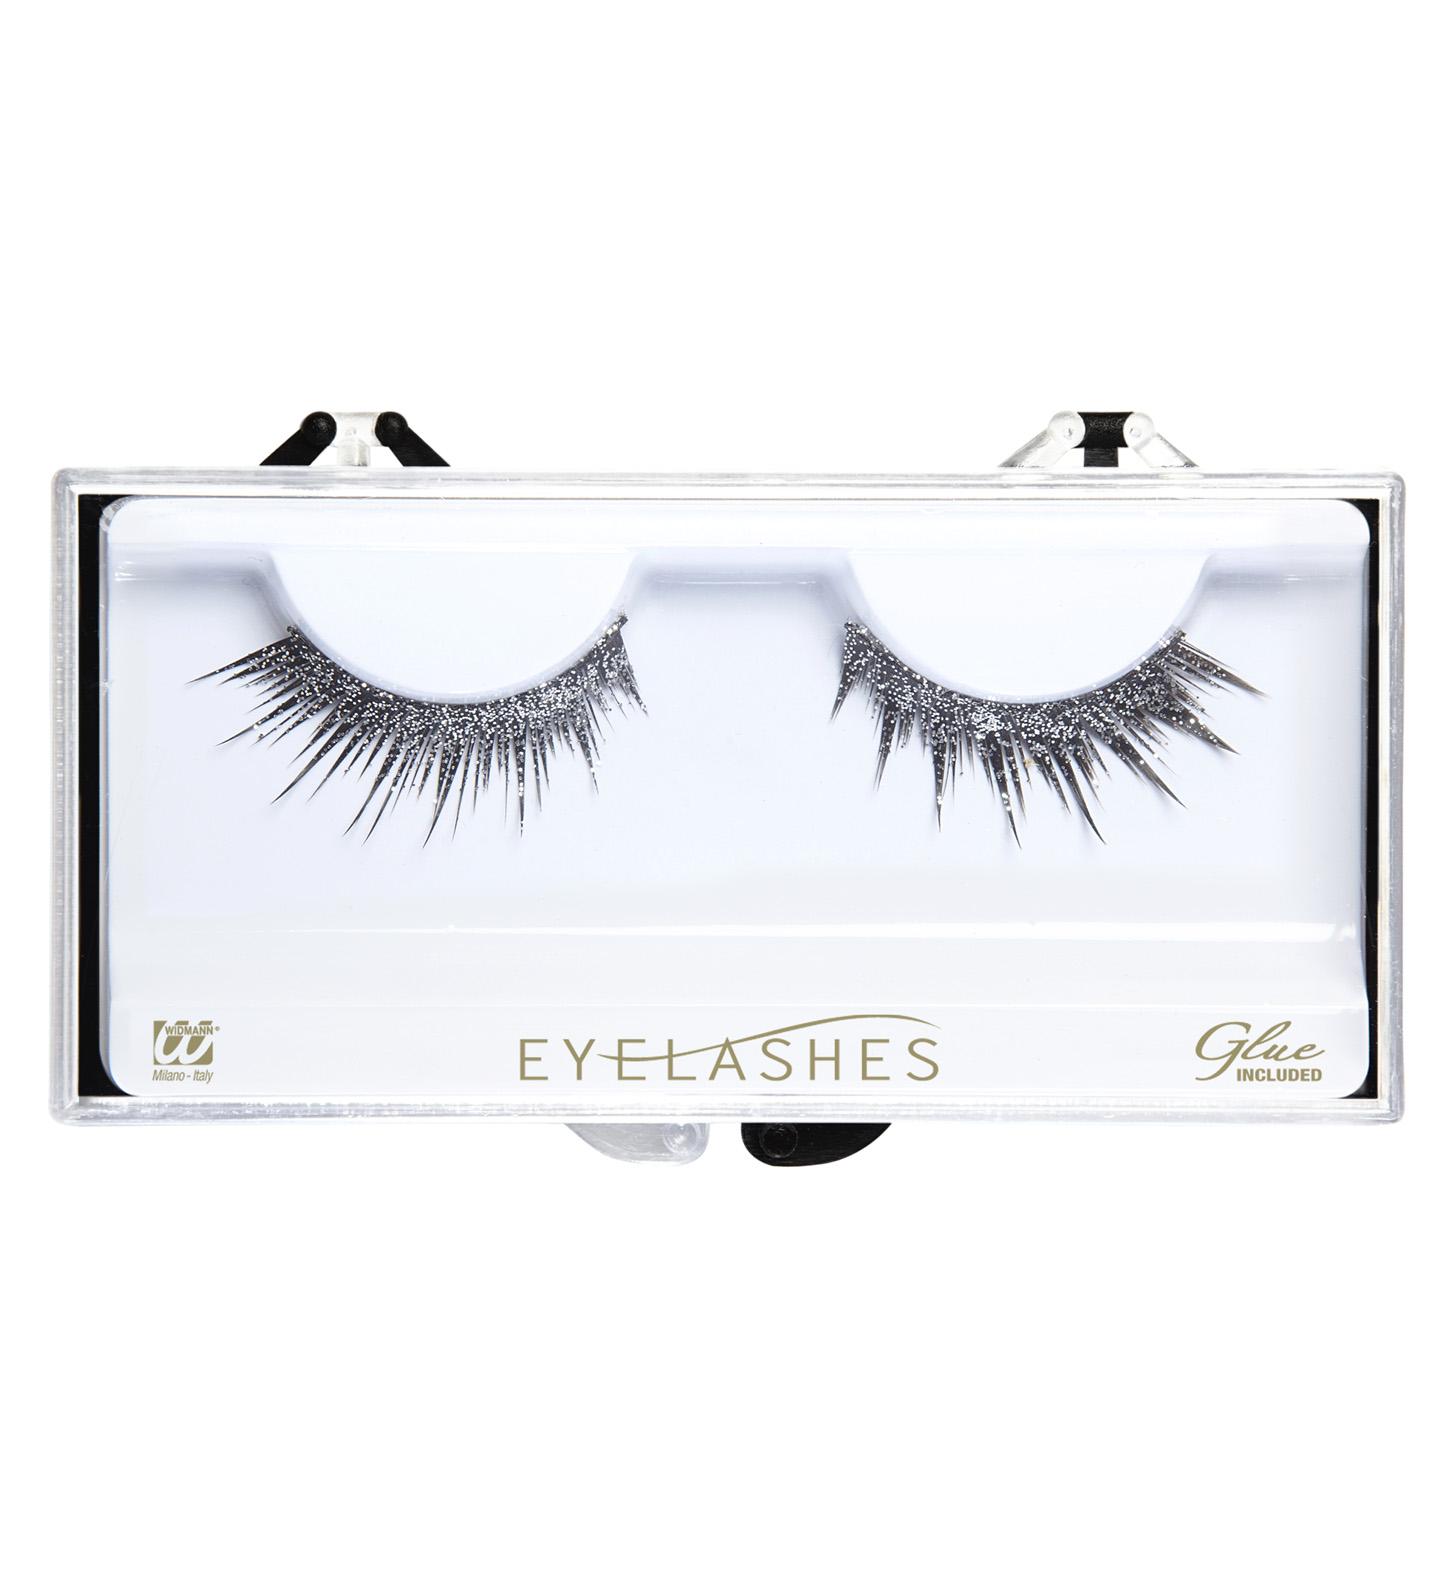 Silver glitter Eyelashes Makeup Cosmetics